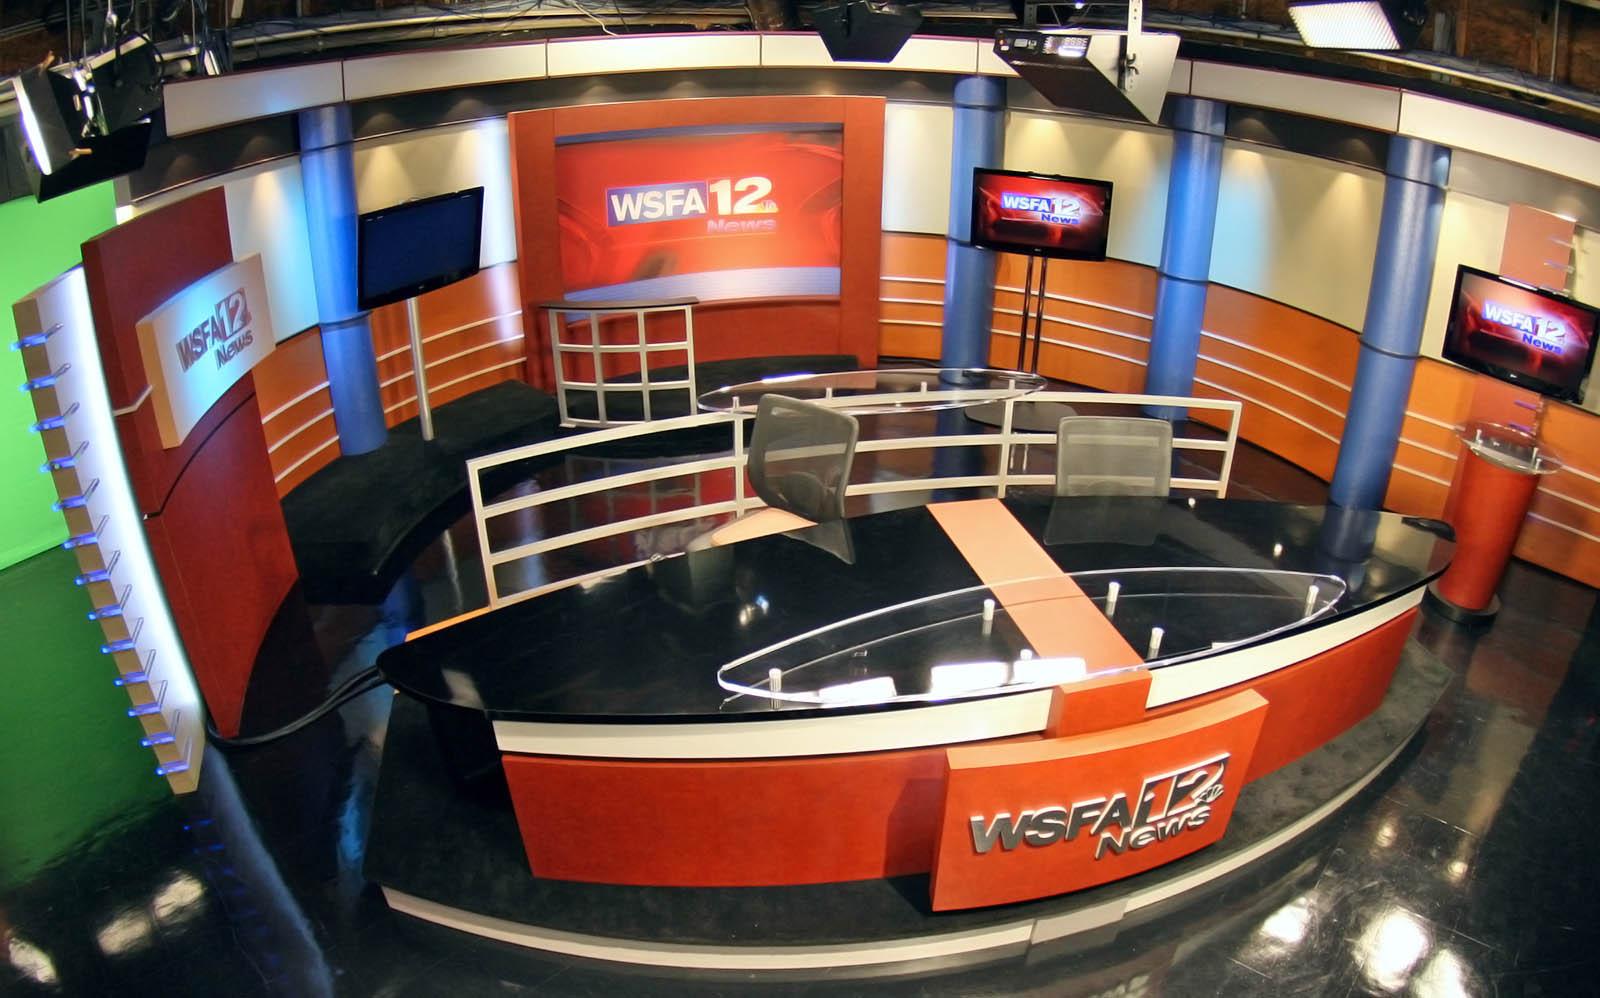 WSFA News live broadcasting studio